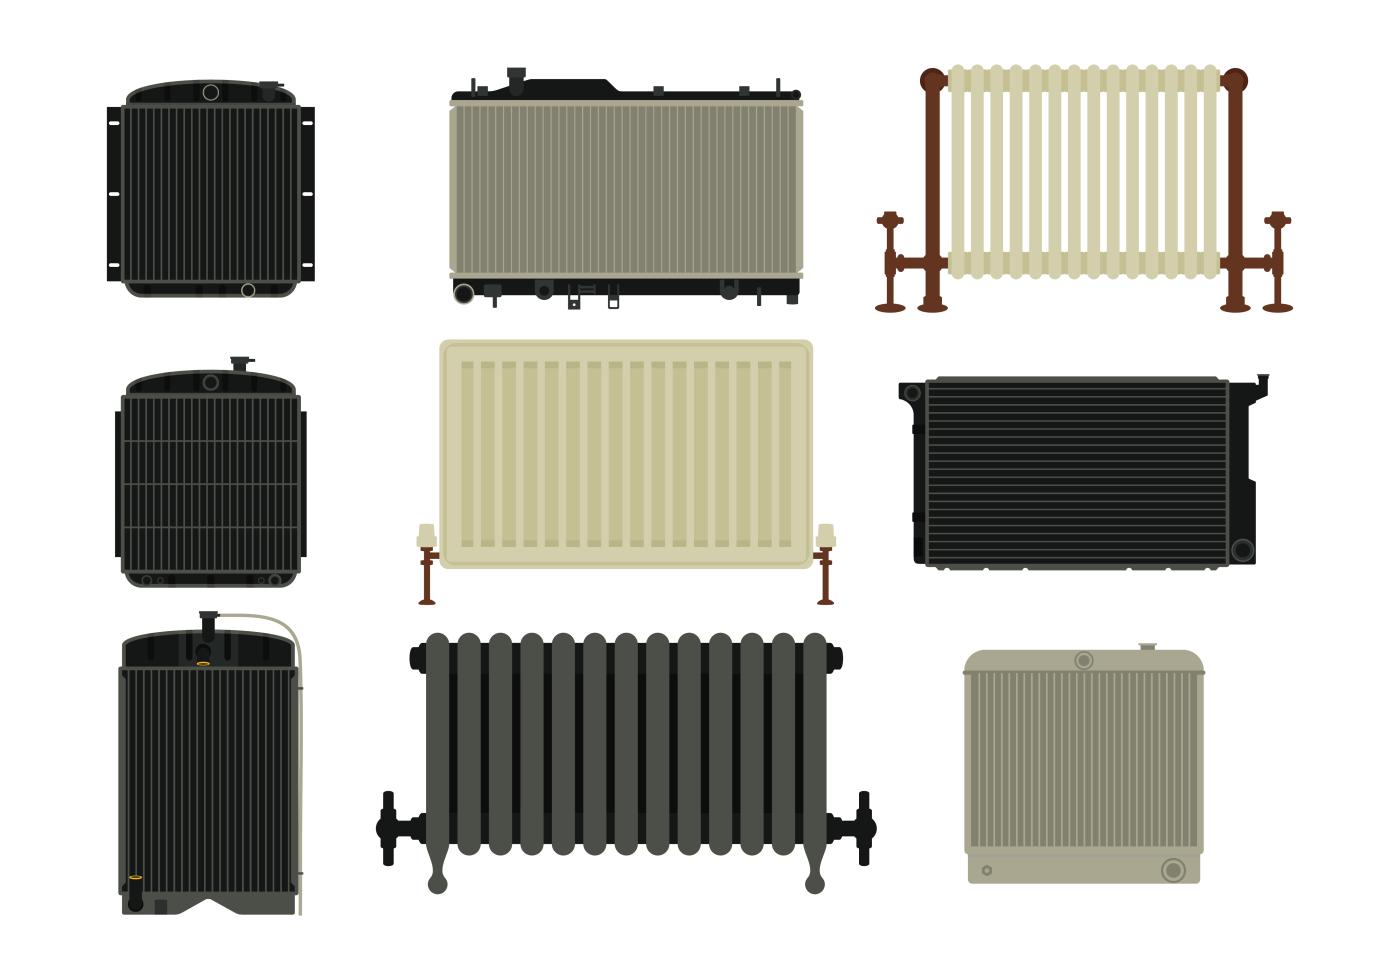 Radiator Vector Icons Download Free Vector Art Stock